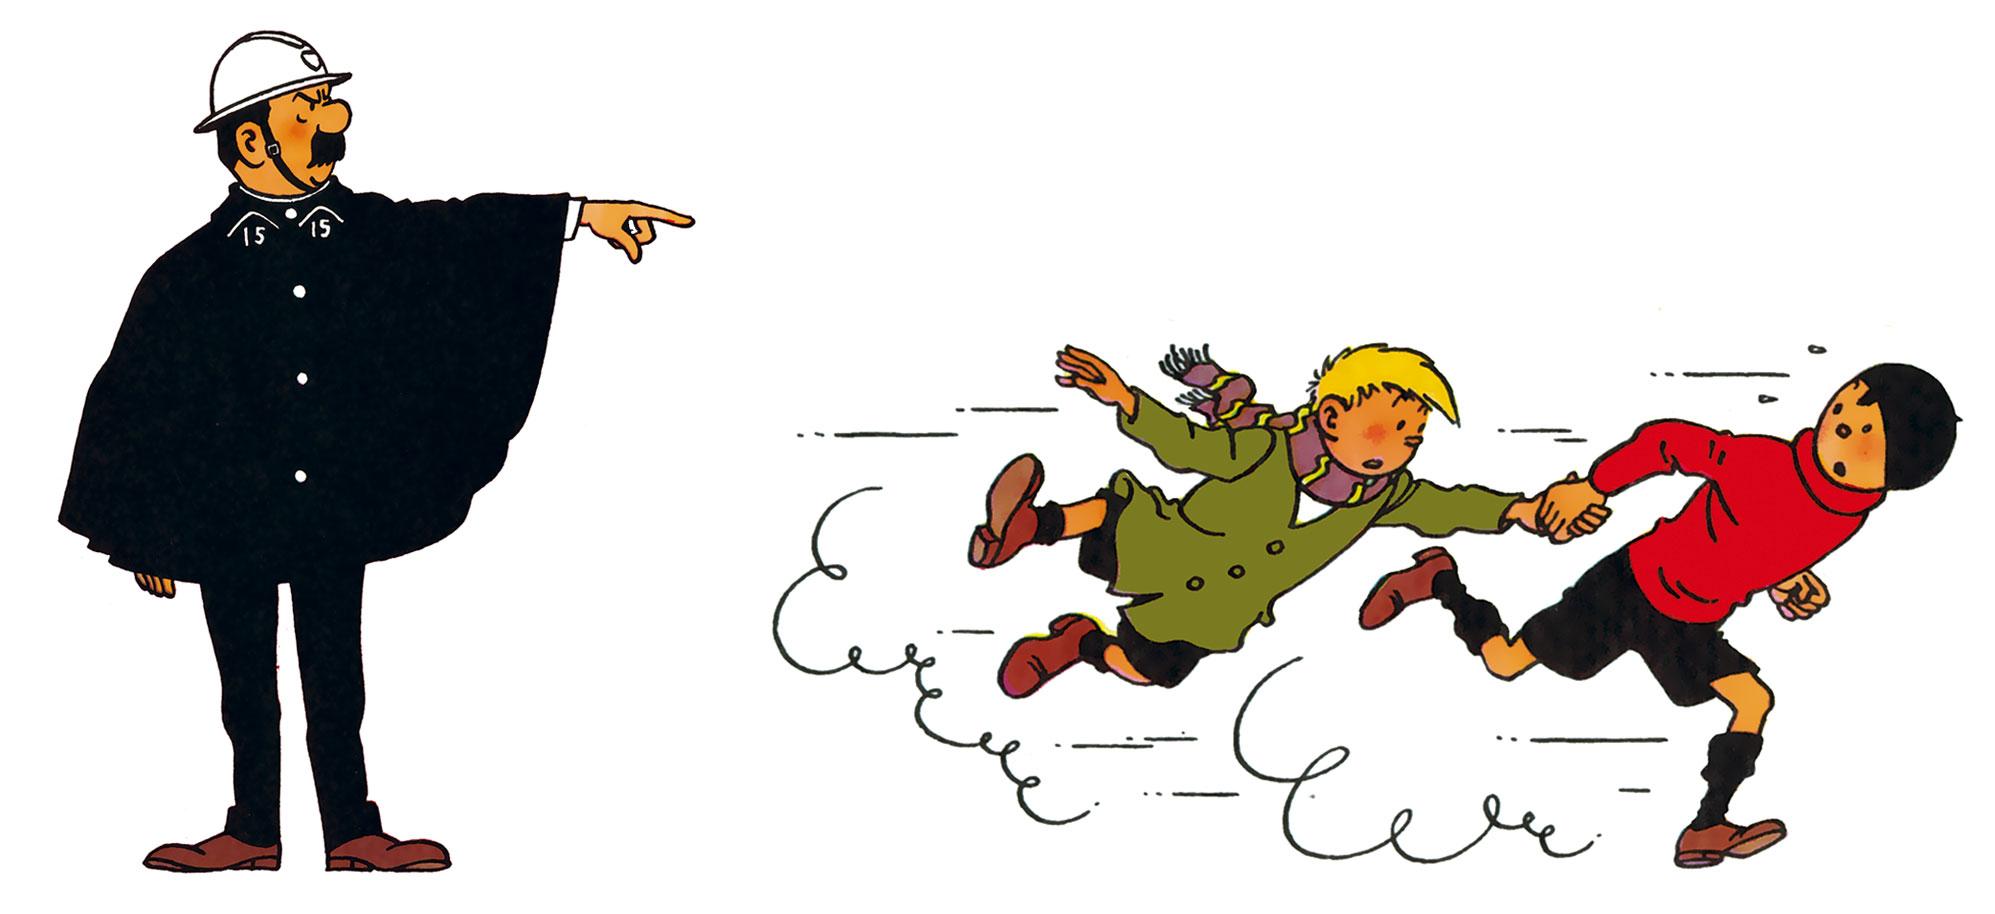 Agent 15 Inspiration personnages Les Dupondt Quick et Flupke